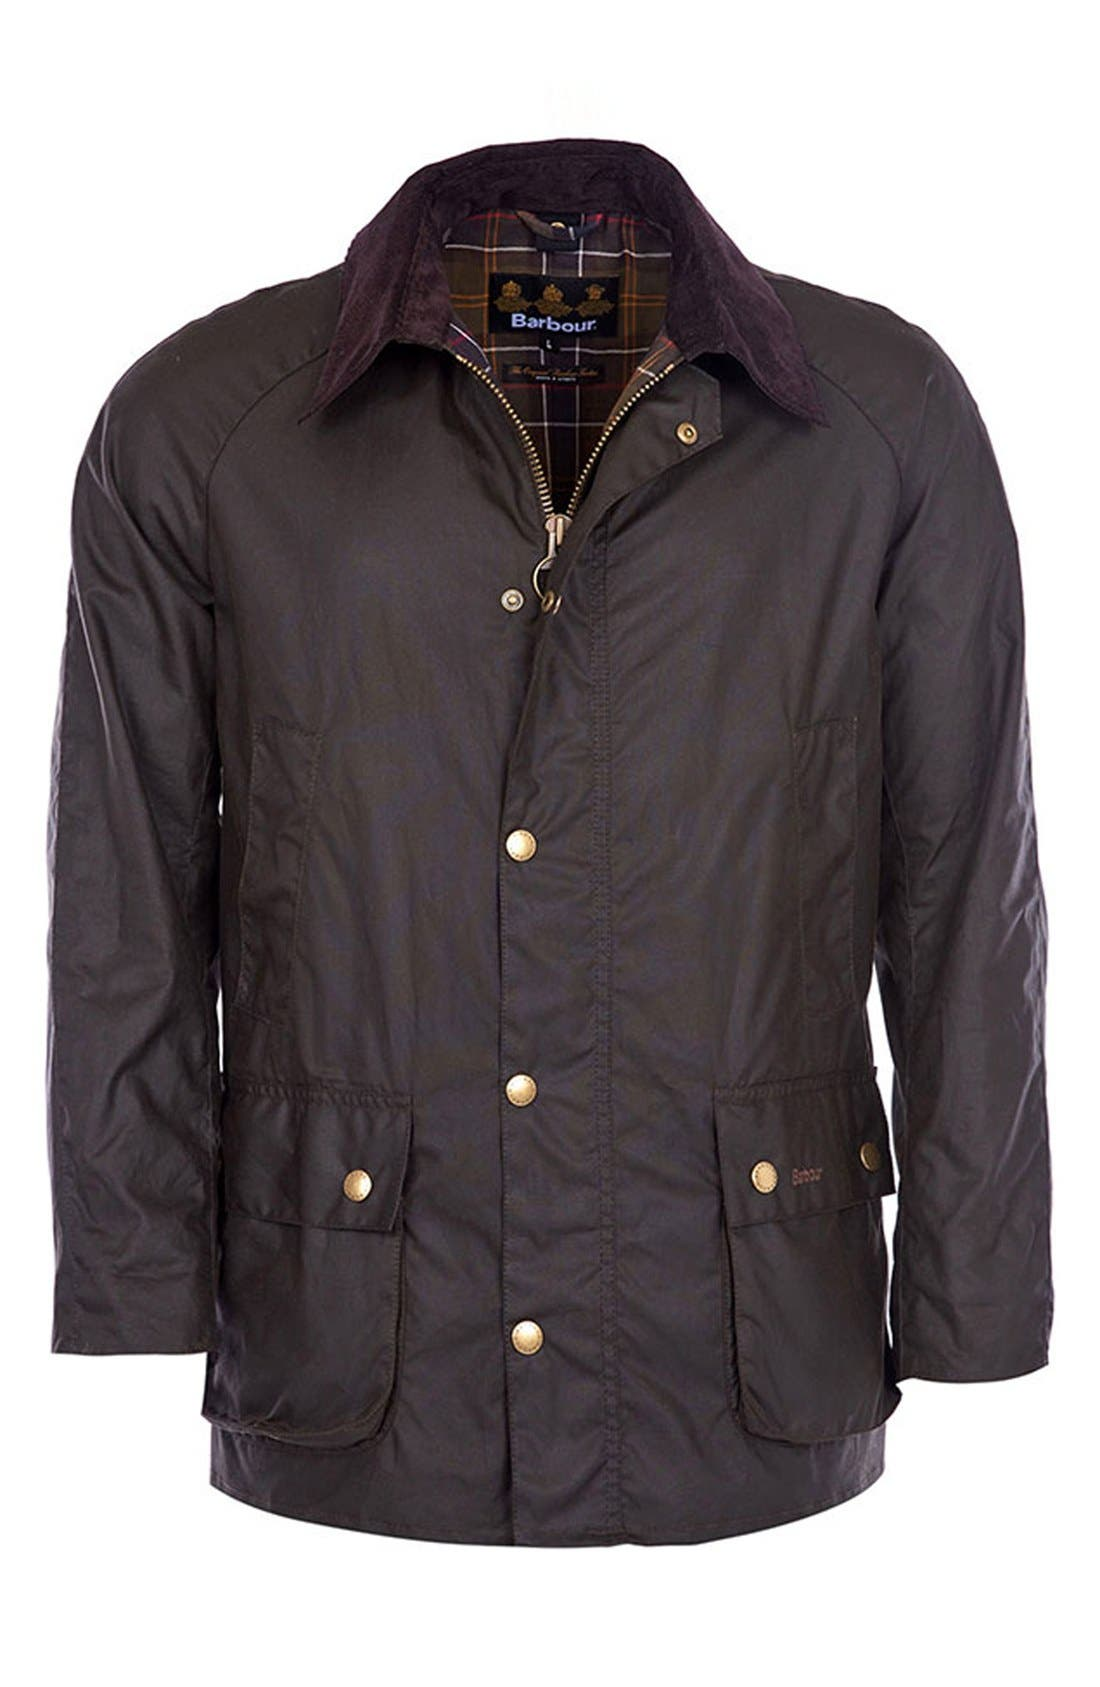 'Ashby' Regular Fit Waterproof Jacket,                             Alternate thumbnail 11, color,                             340